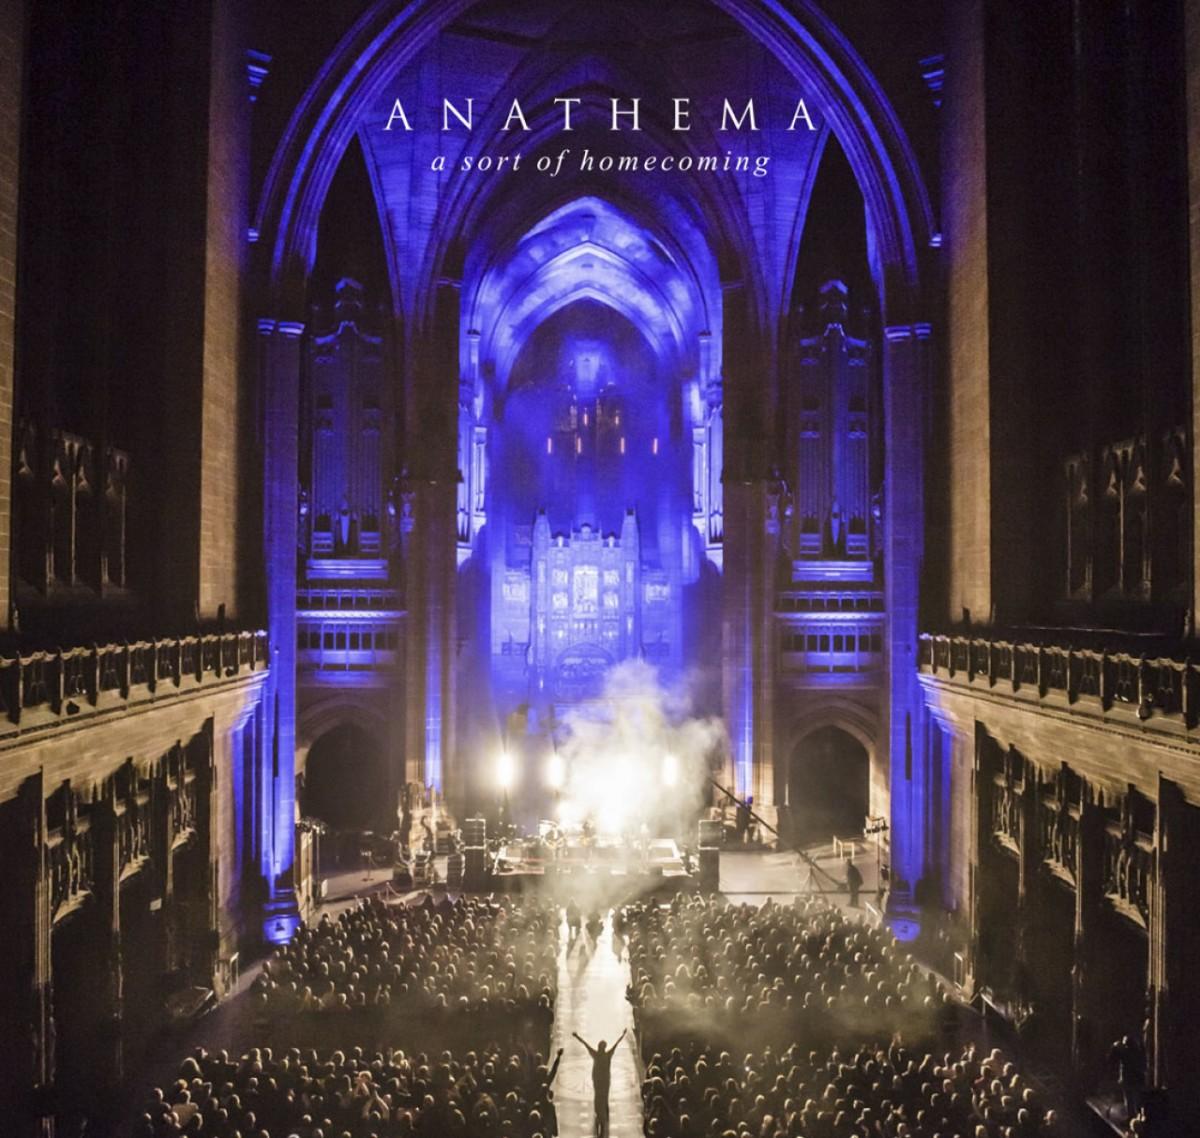 Anathema-ASortOfHomecoming2015_1280